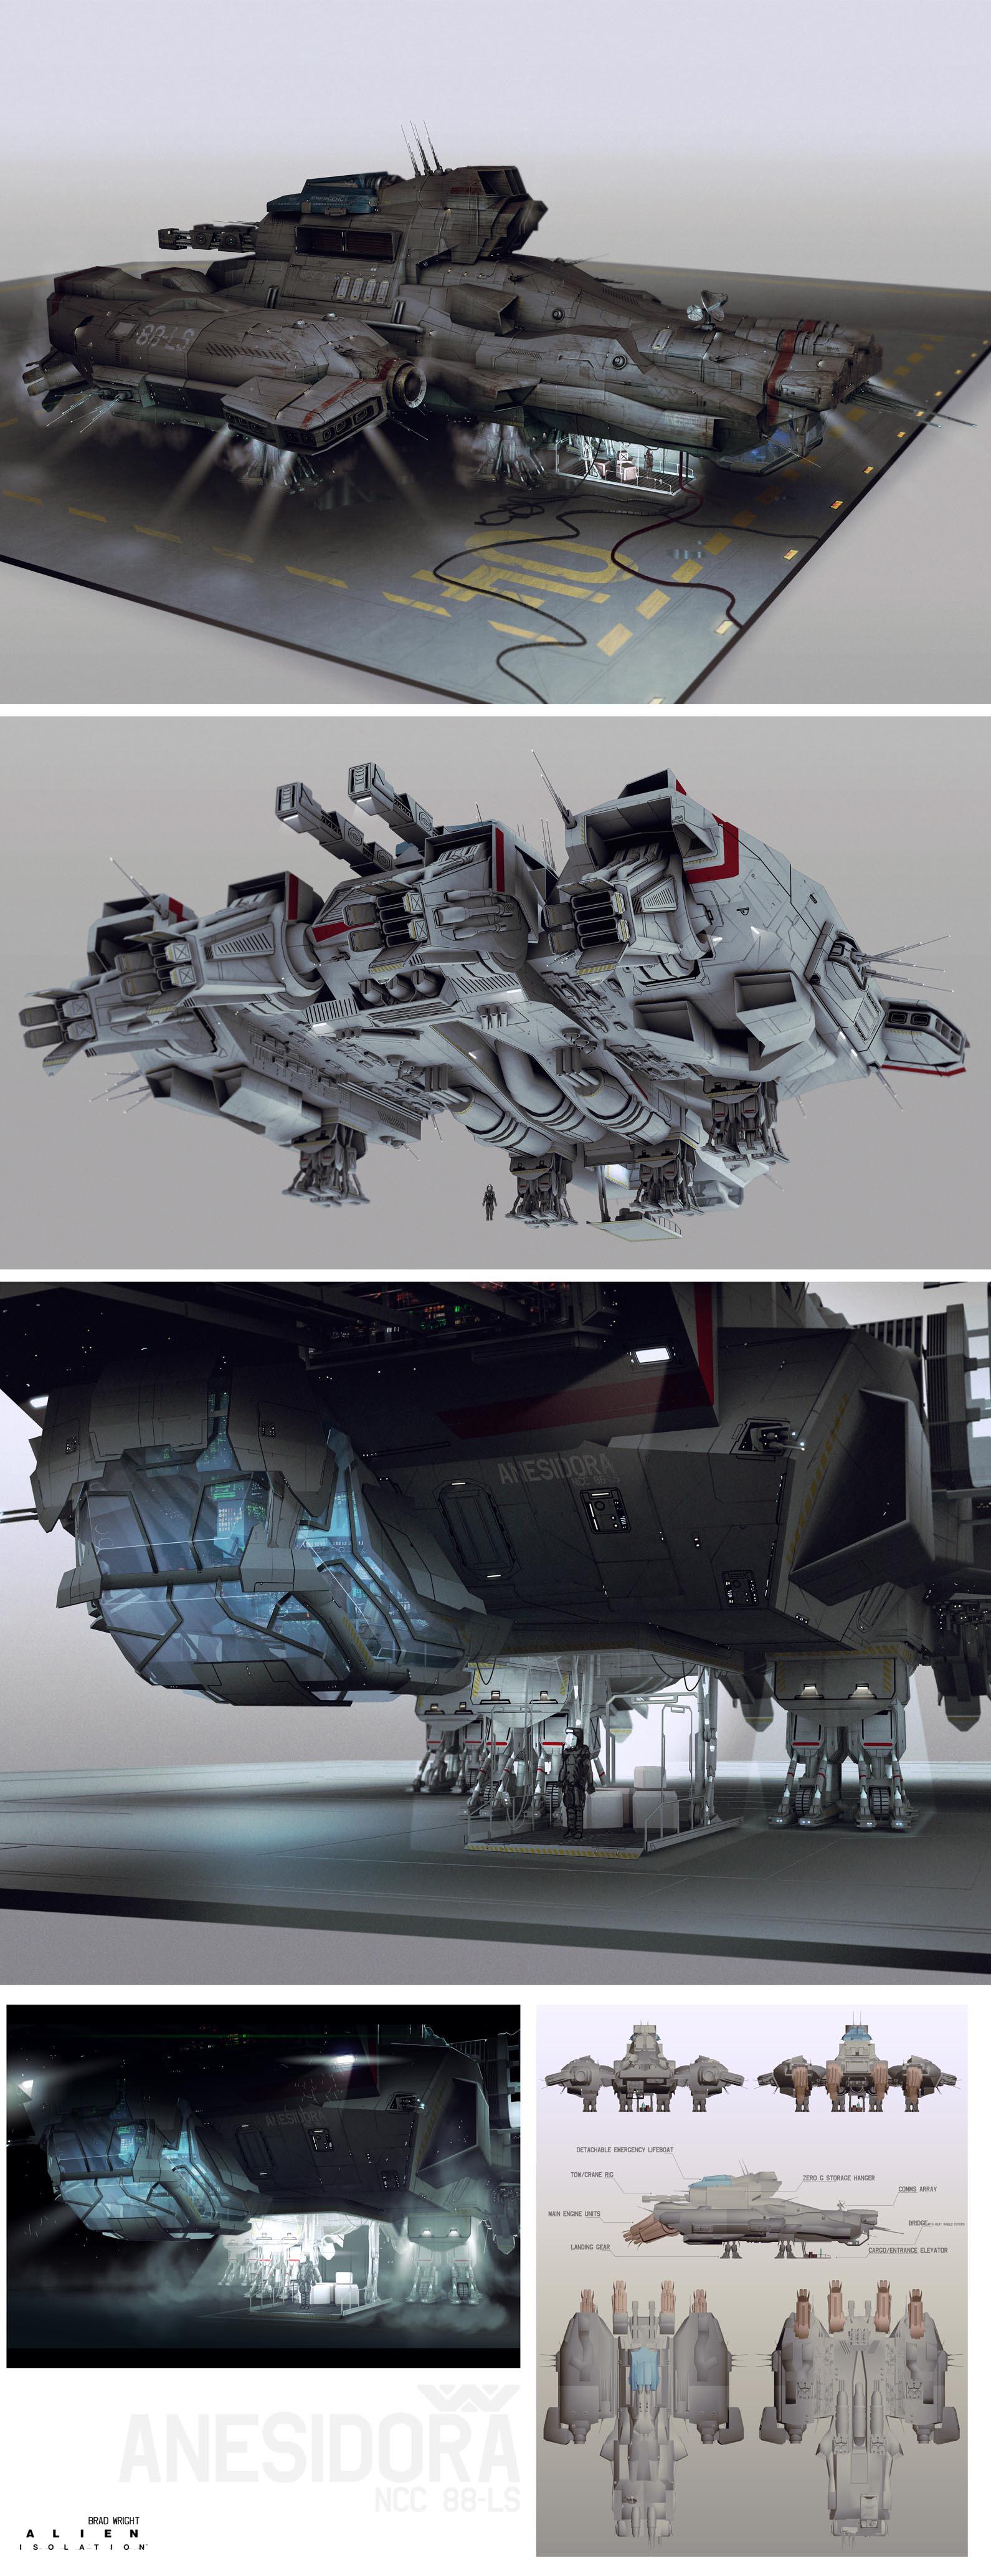 Alien: Isolation Concept Art by Brad Wright (14 pics)